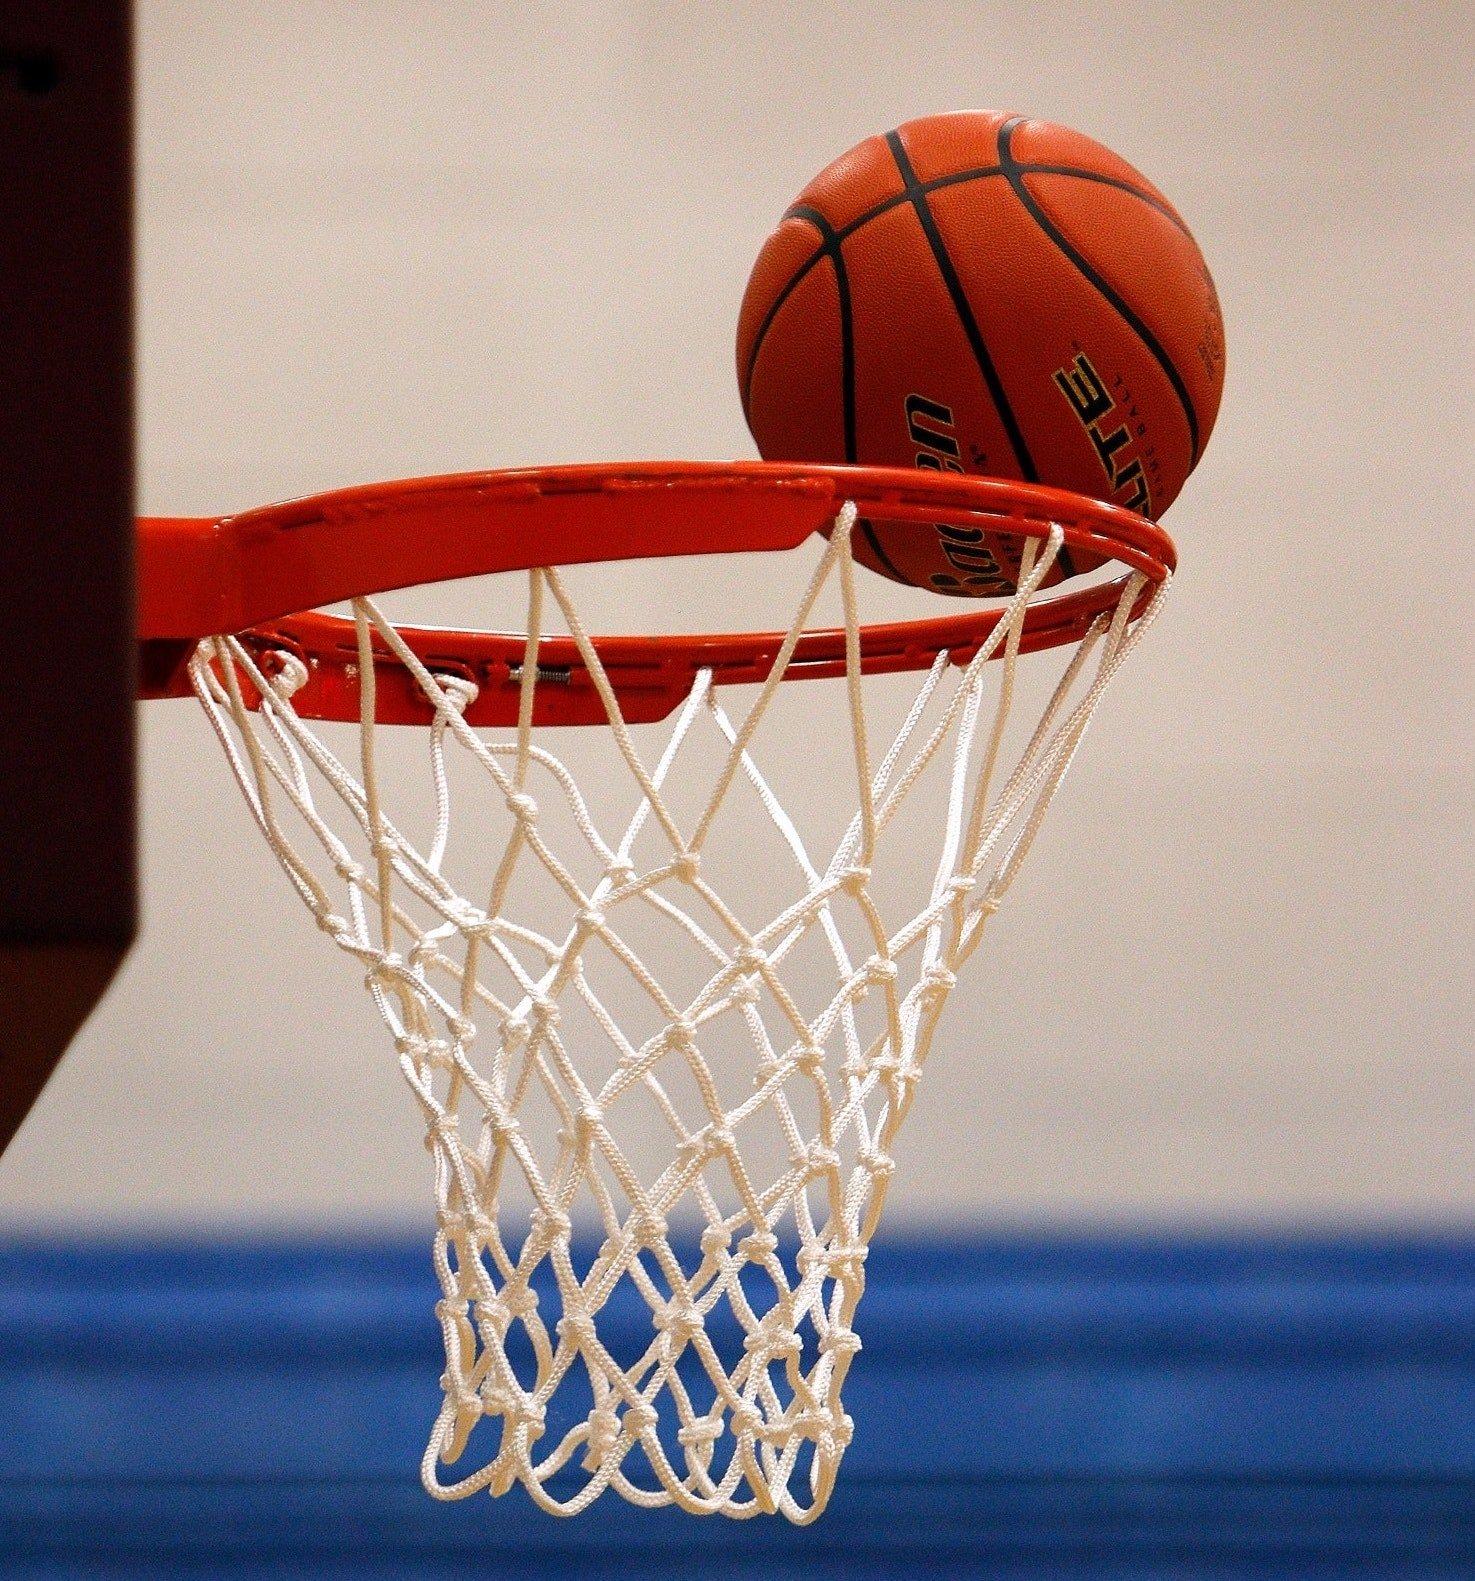 action-backboard-ball-basketball-358042-1